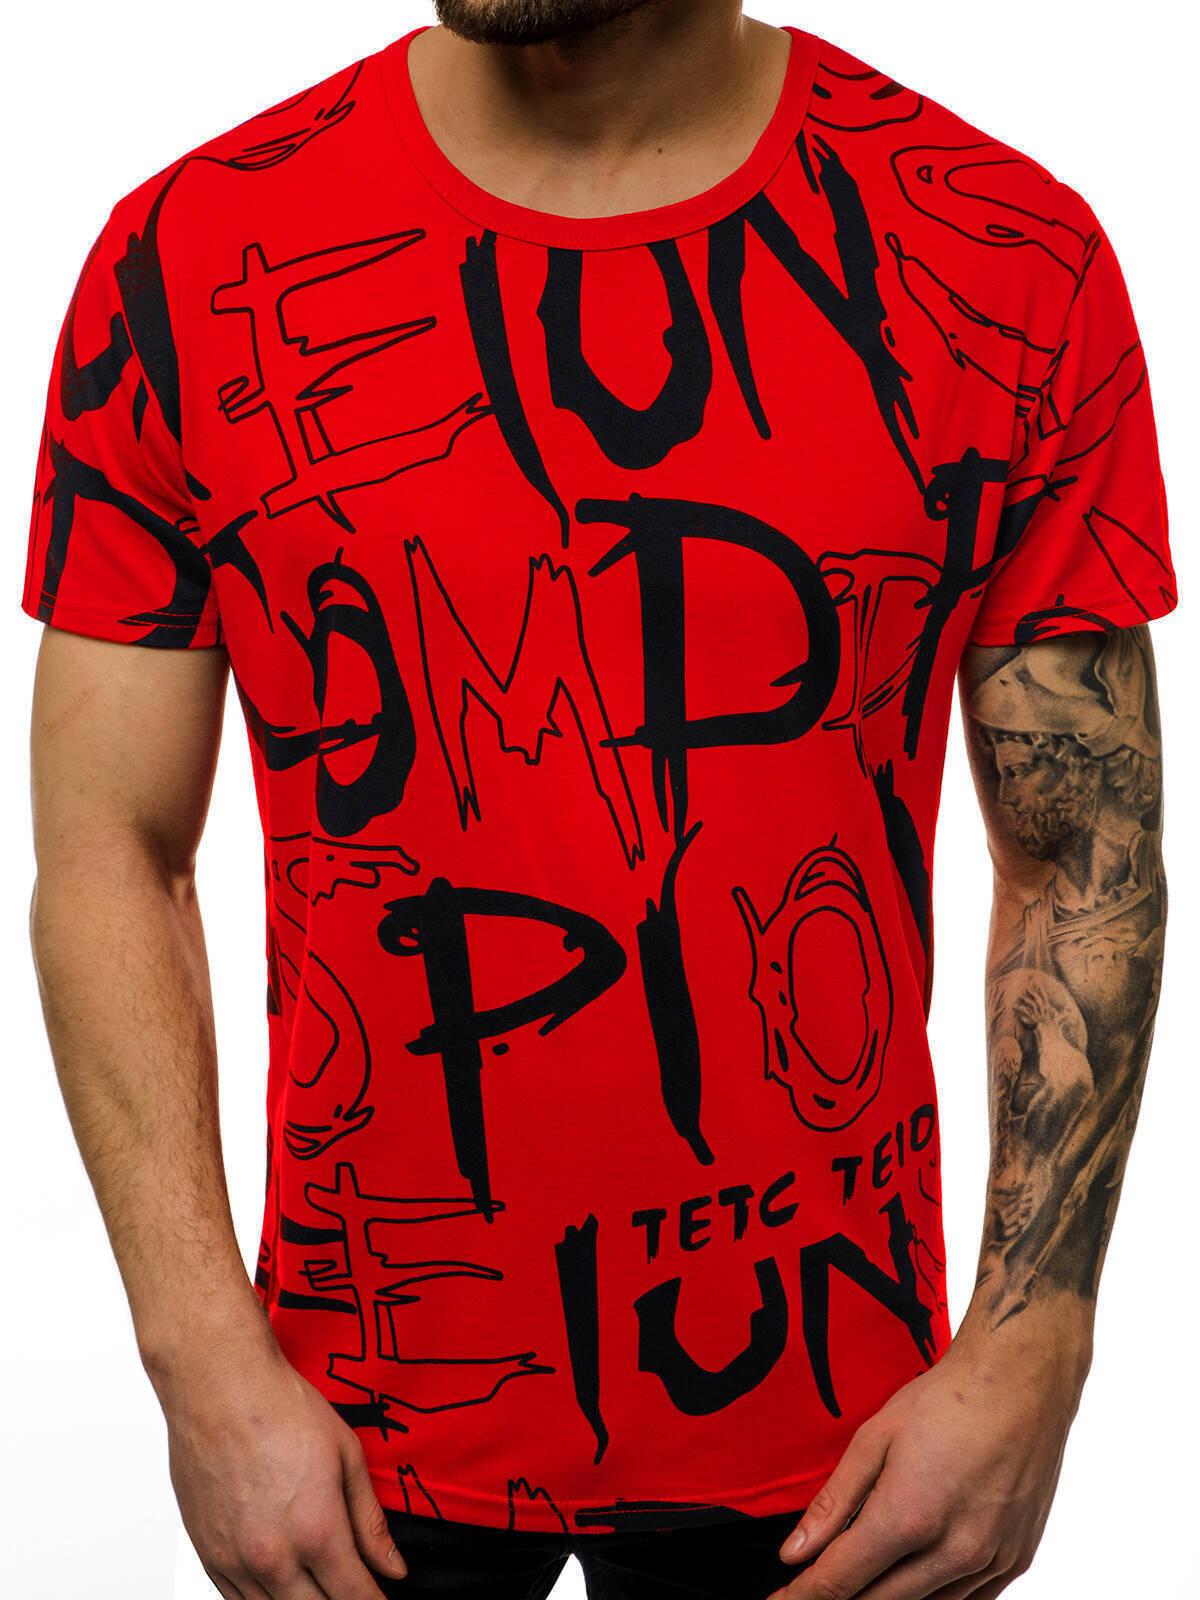 Indexbild 8 - T-Shirt Kurzarm Print Aufdruck Fitness Jogging Sport Shirt Herren OZONEE 12511